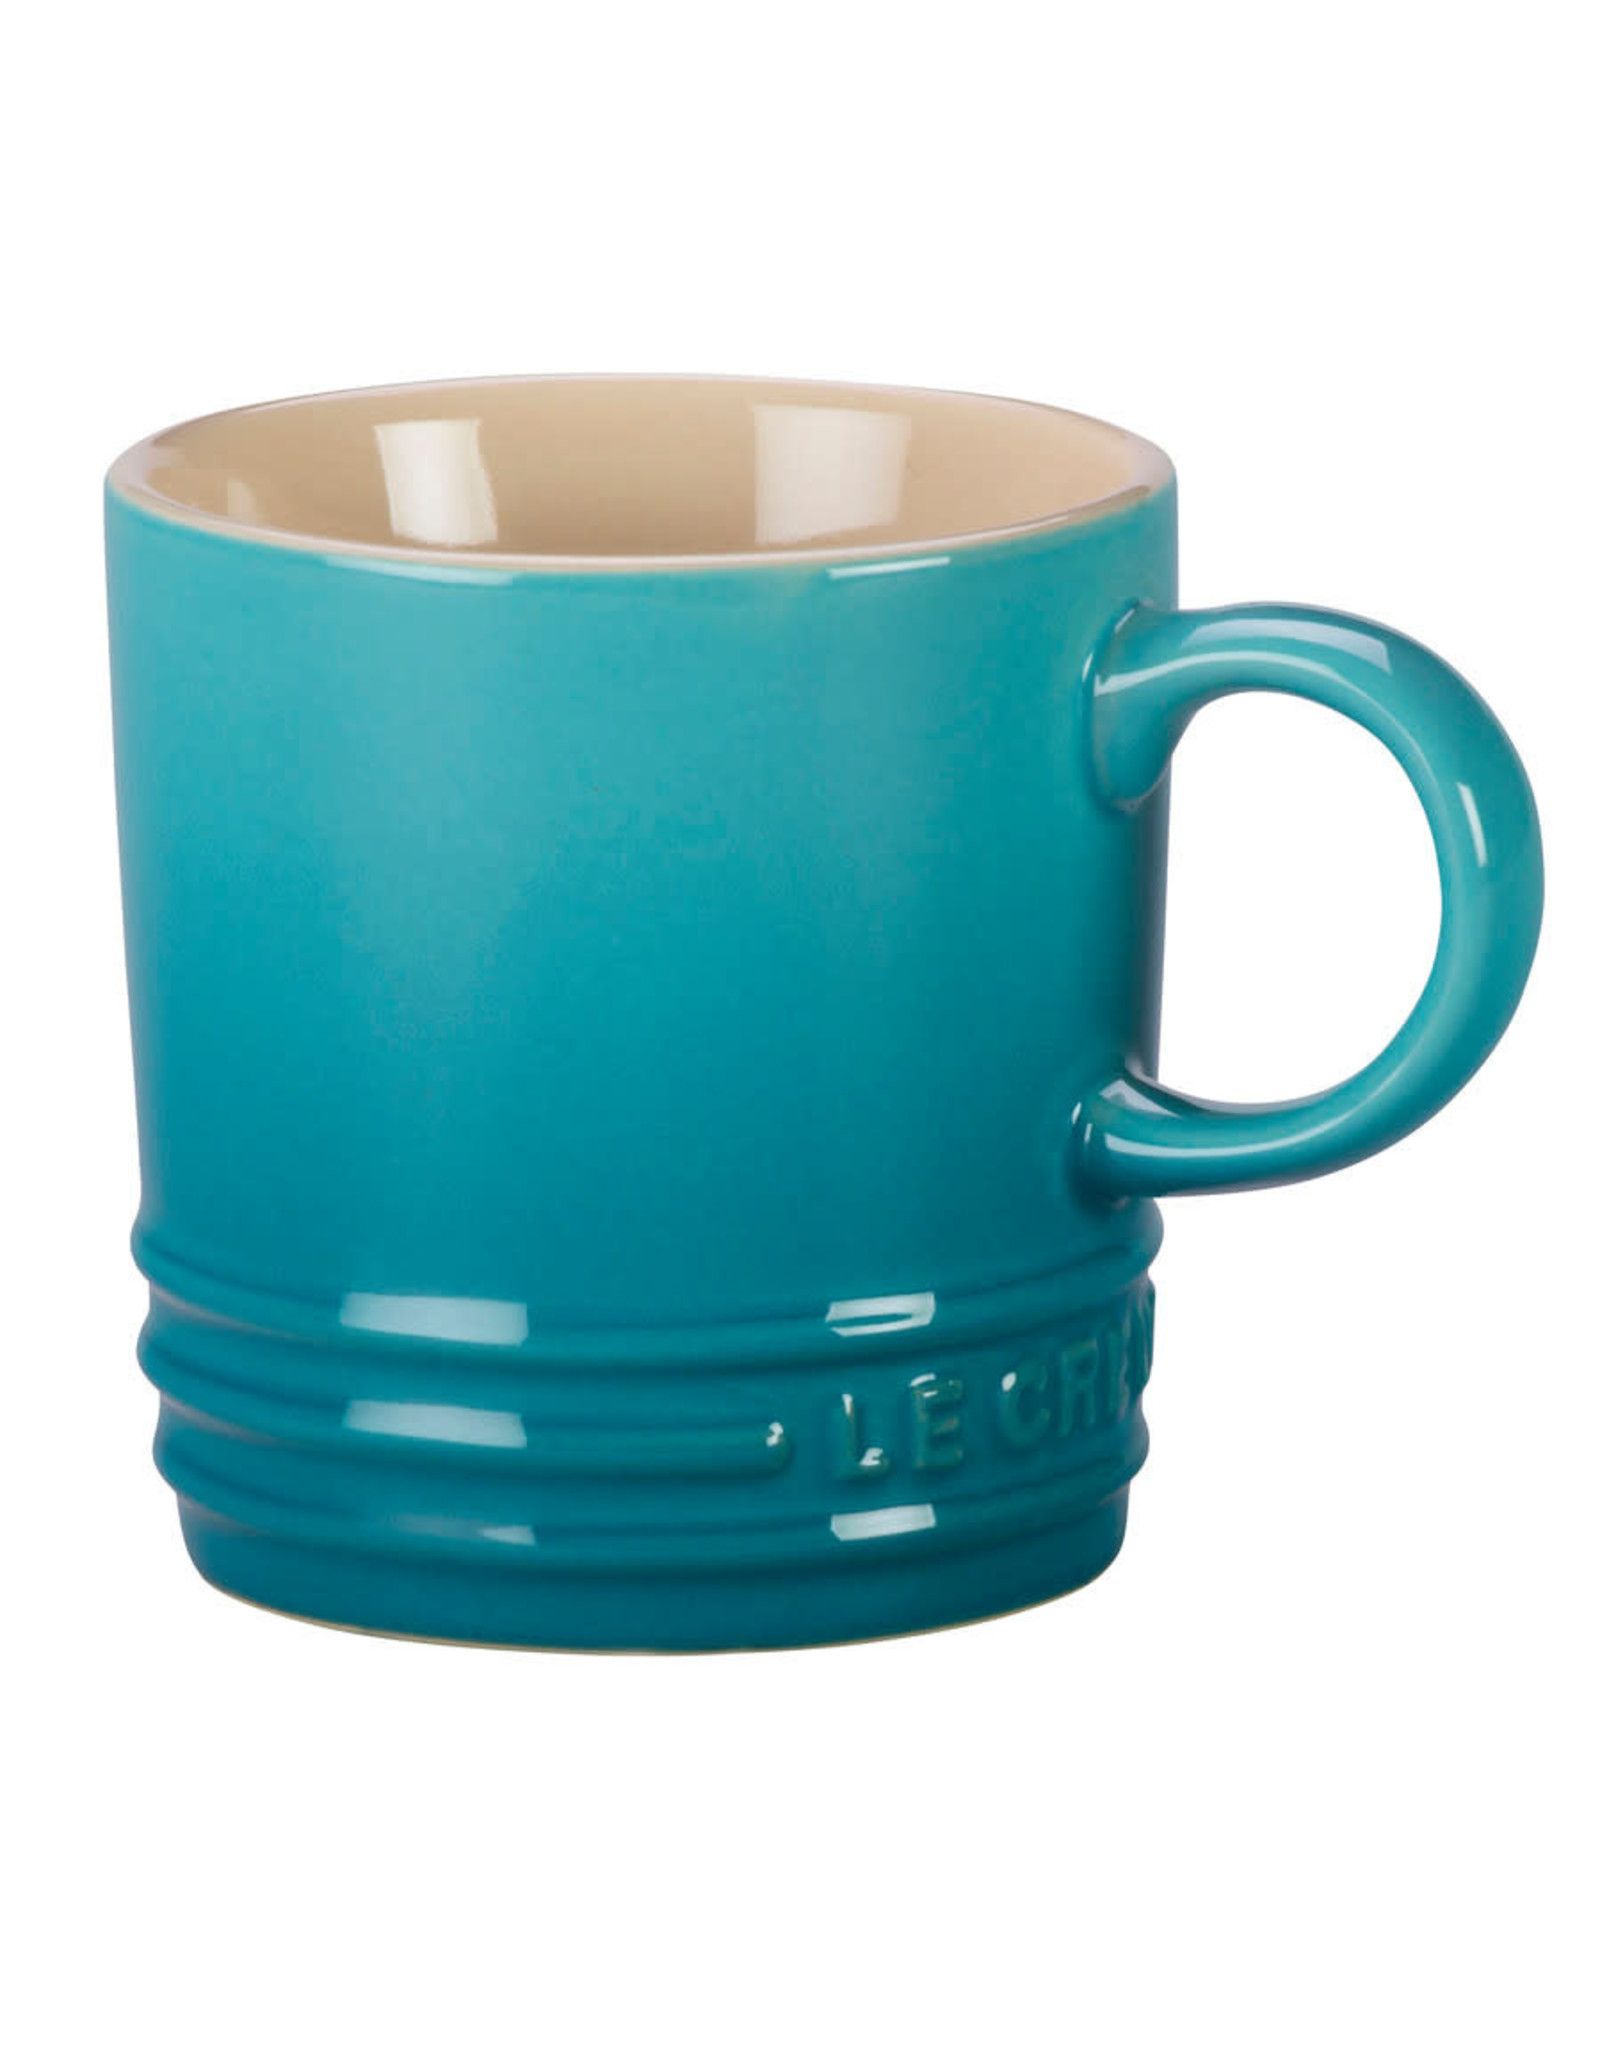 Le Creuset Le Creuset Espresso Mug Caribbean